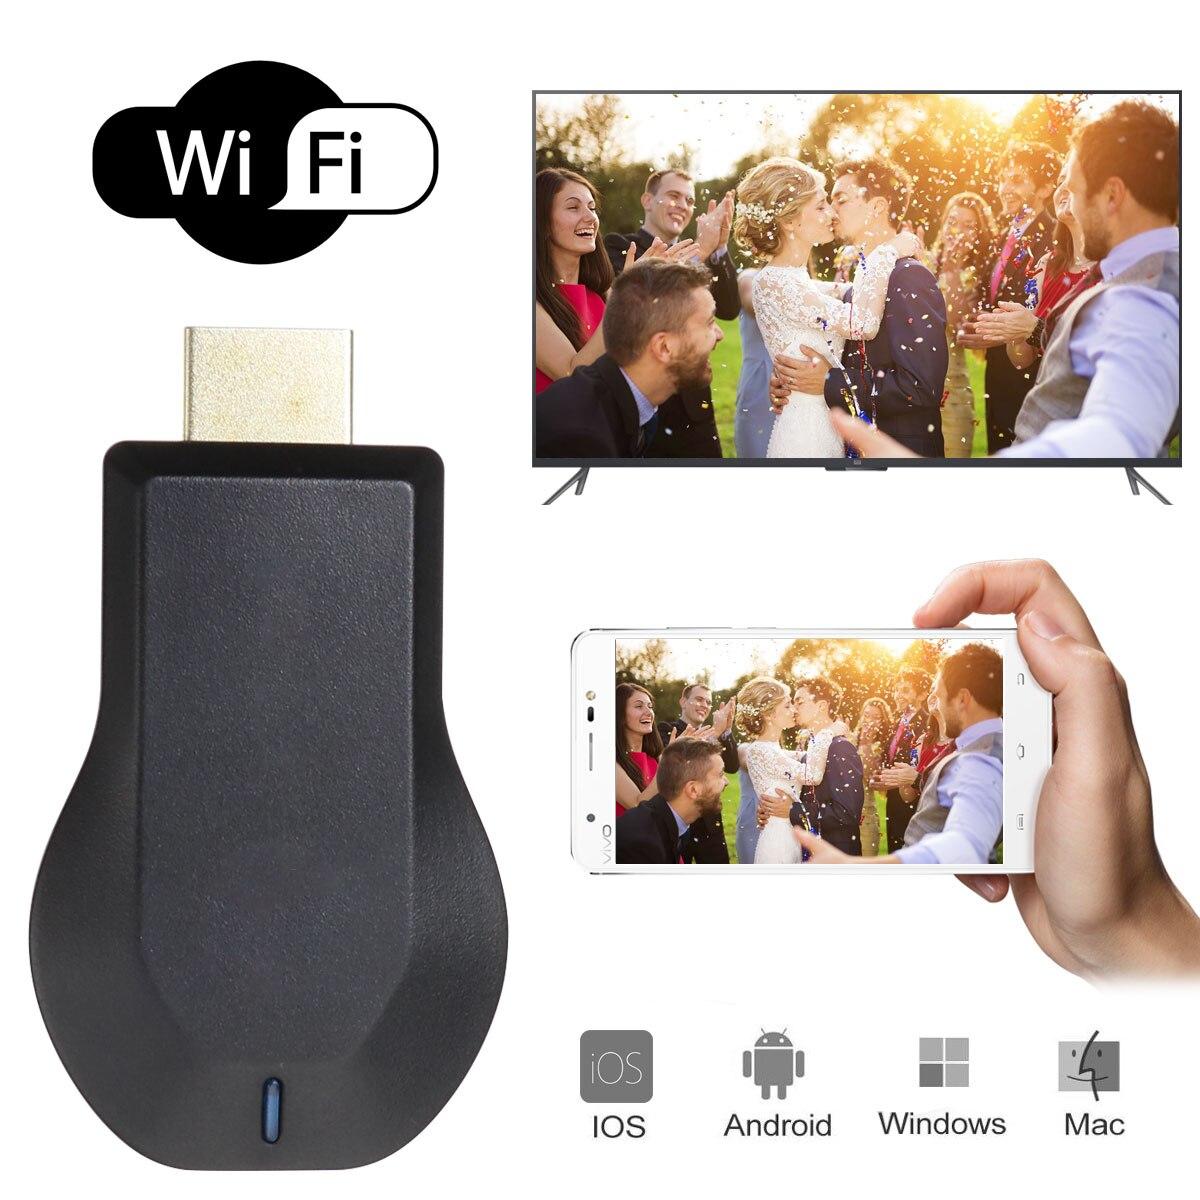 wireless hdmi wifi display allshare Adapter TV stick Receiver Support windows ios andriod vs Google chromecast 2 miracast